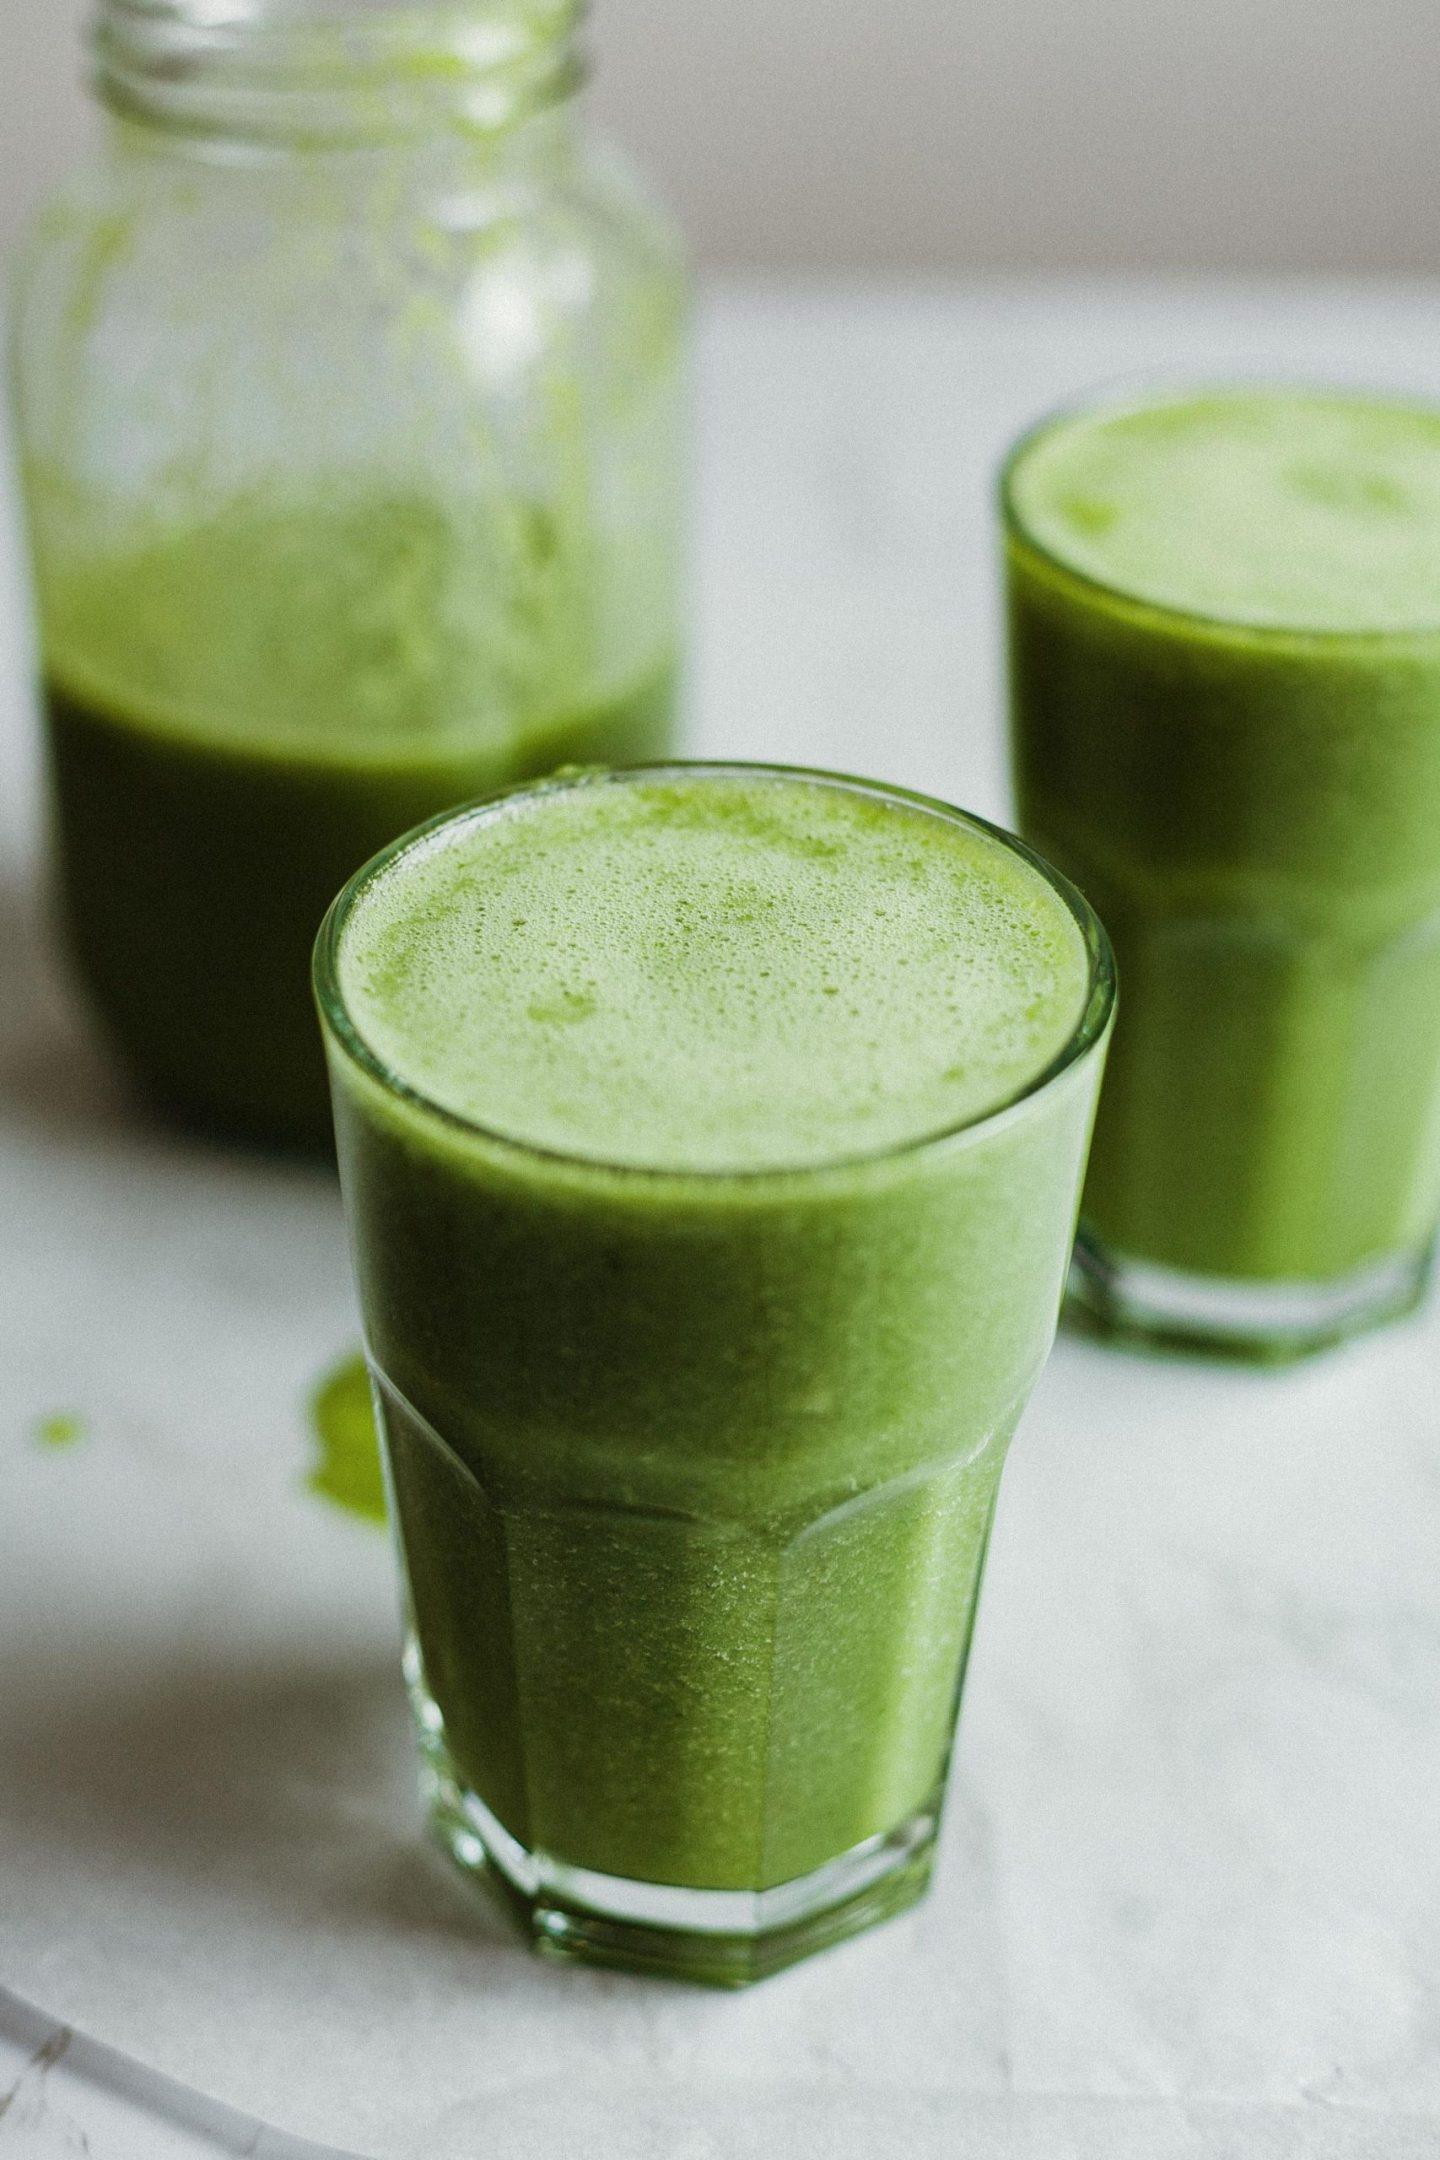 Benefits of Drinking Celery Juice